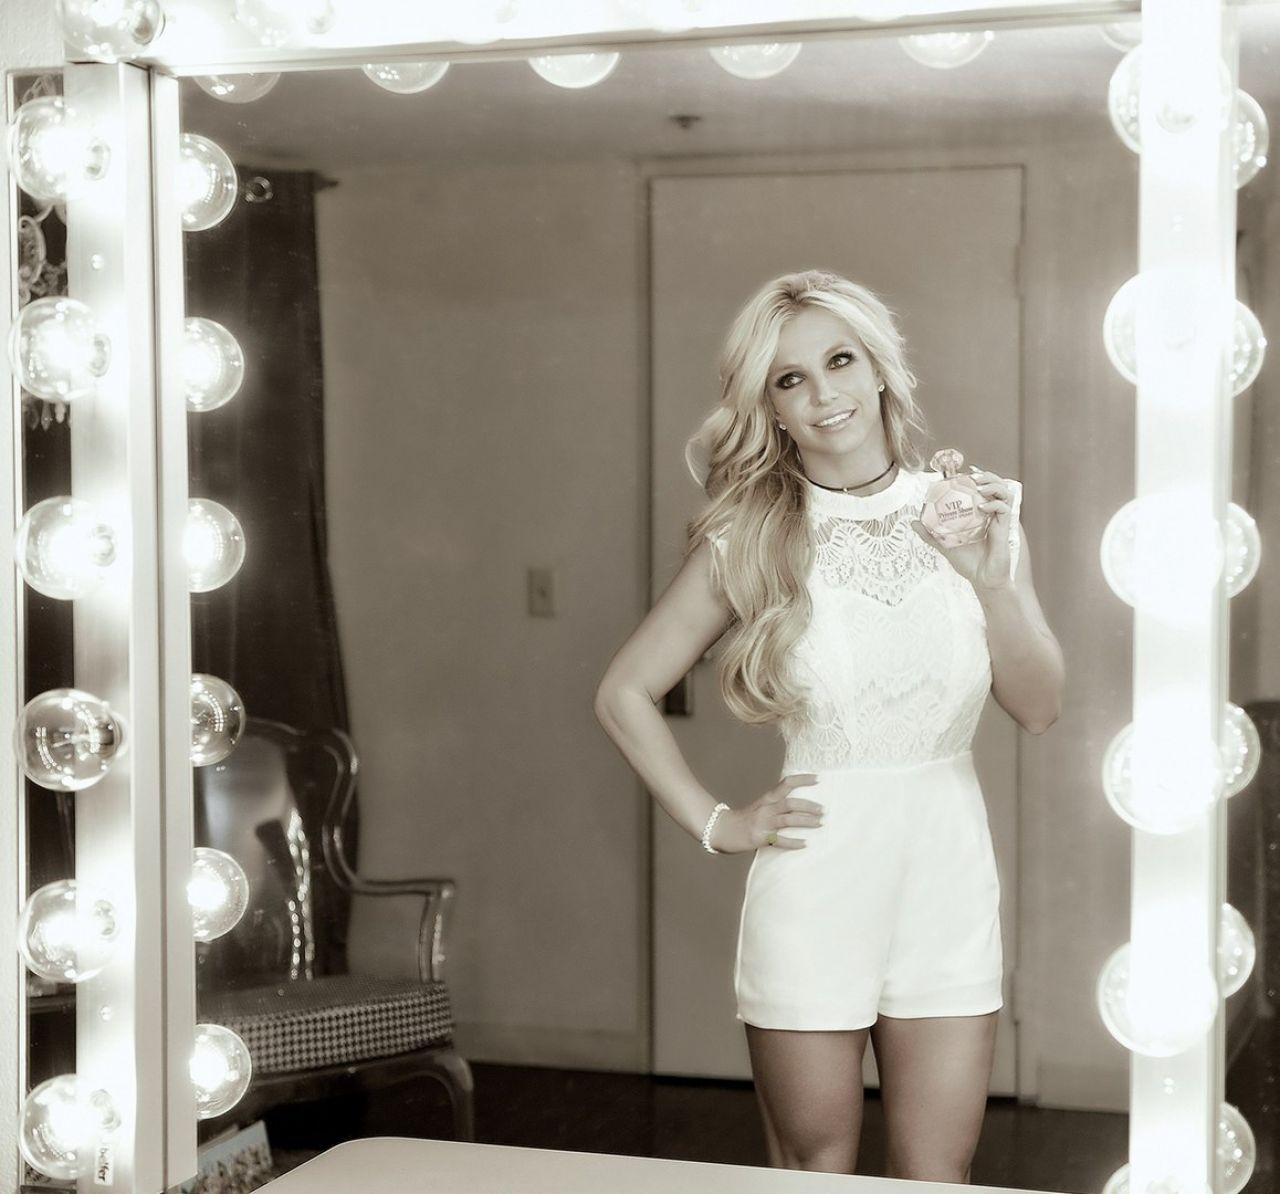 Britney Spears - VIP Private Show Fragrance Promo ...